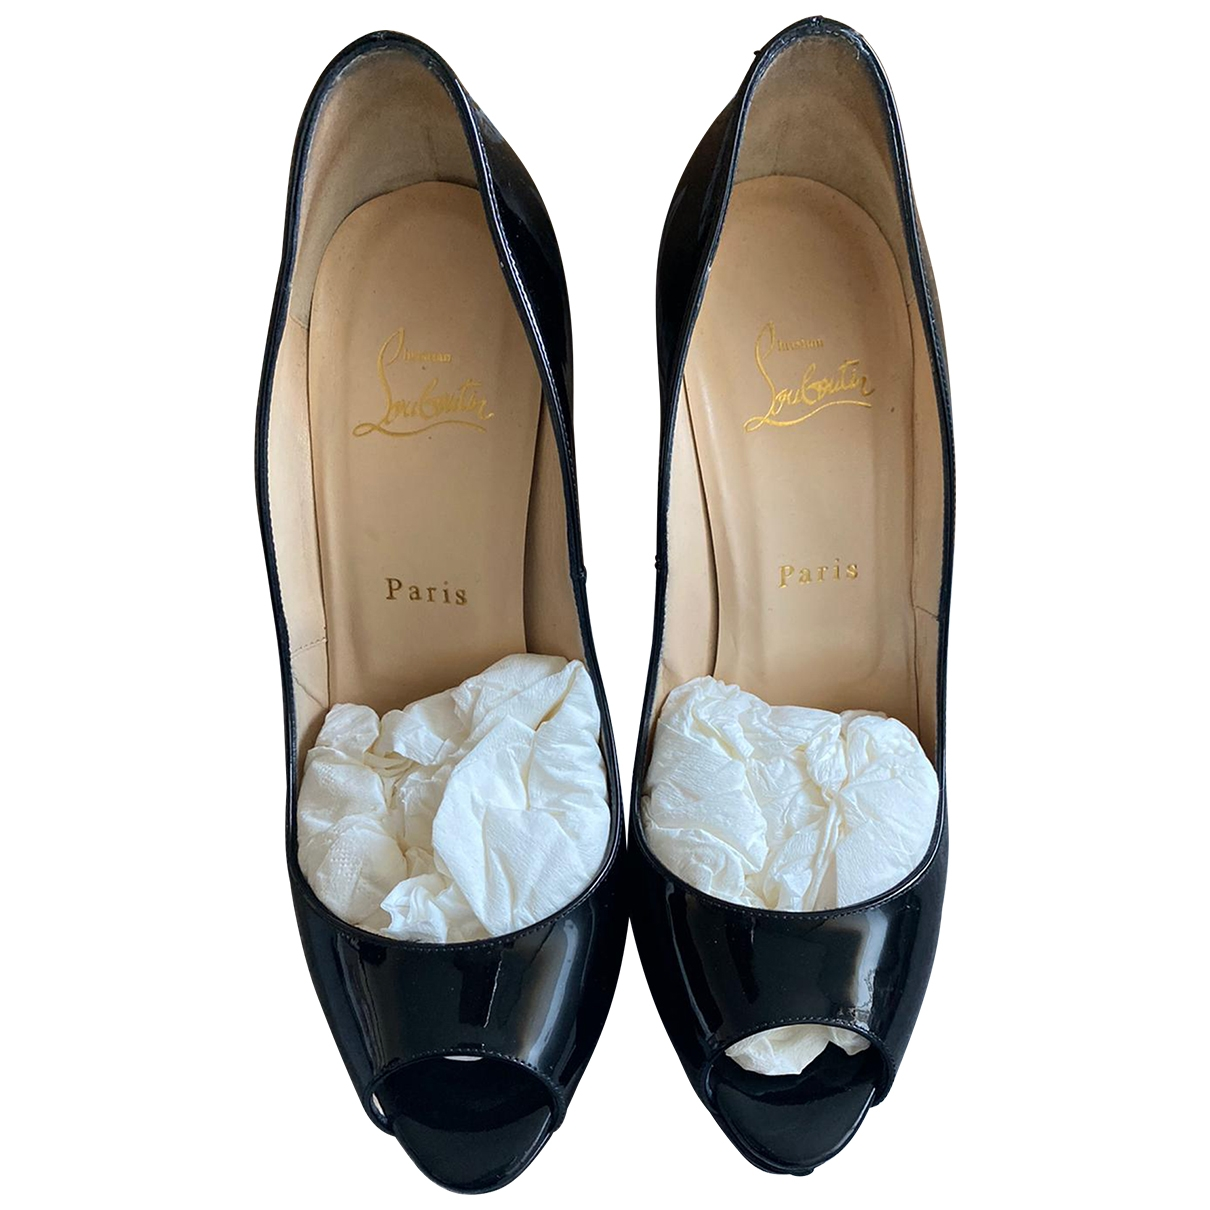 Christian Louboutin Very Privé Black Patent leather Heels for Women 39 EU